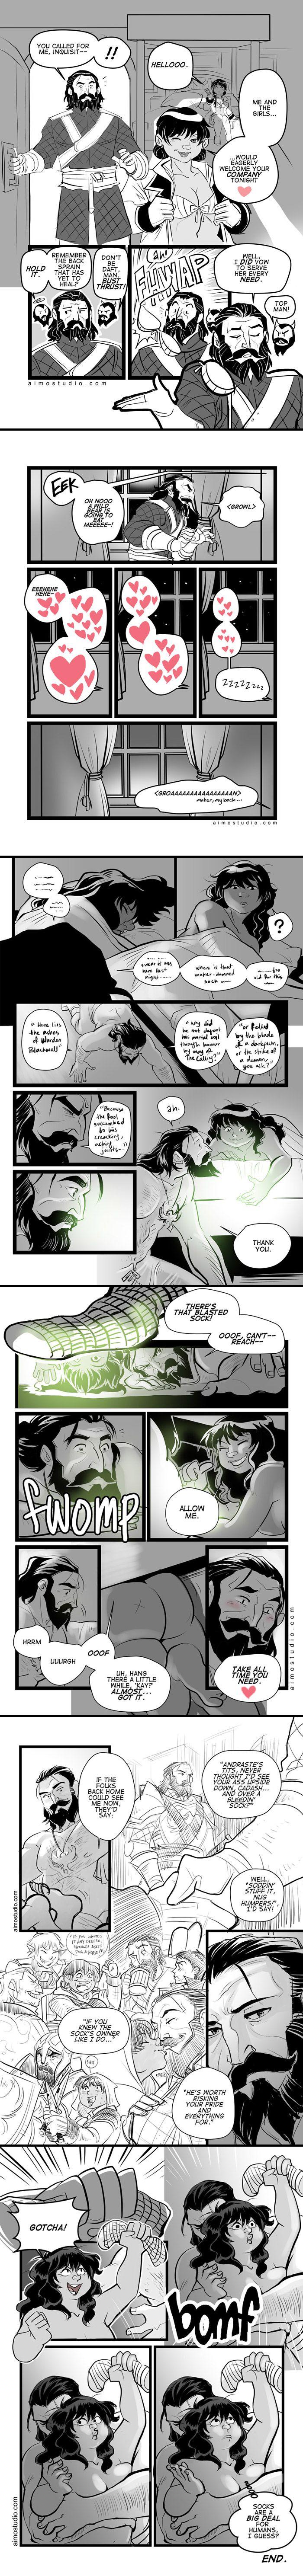 DAI The Sock Saga by aimo on DeviantArt